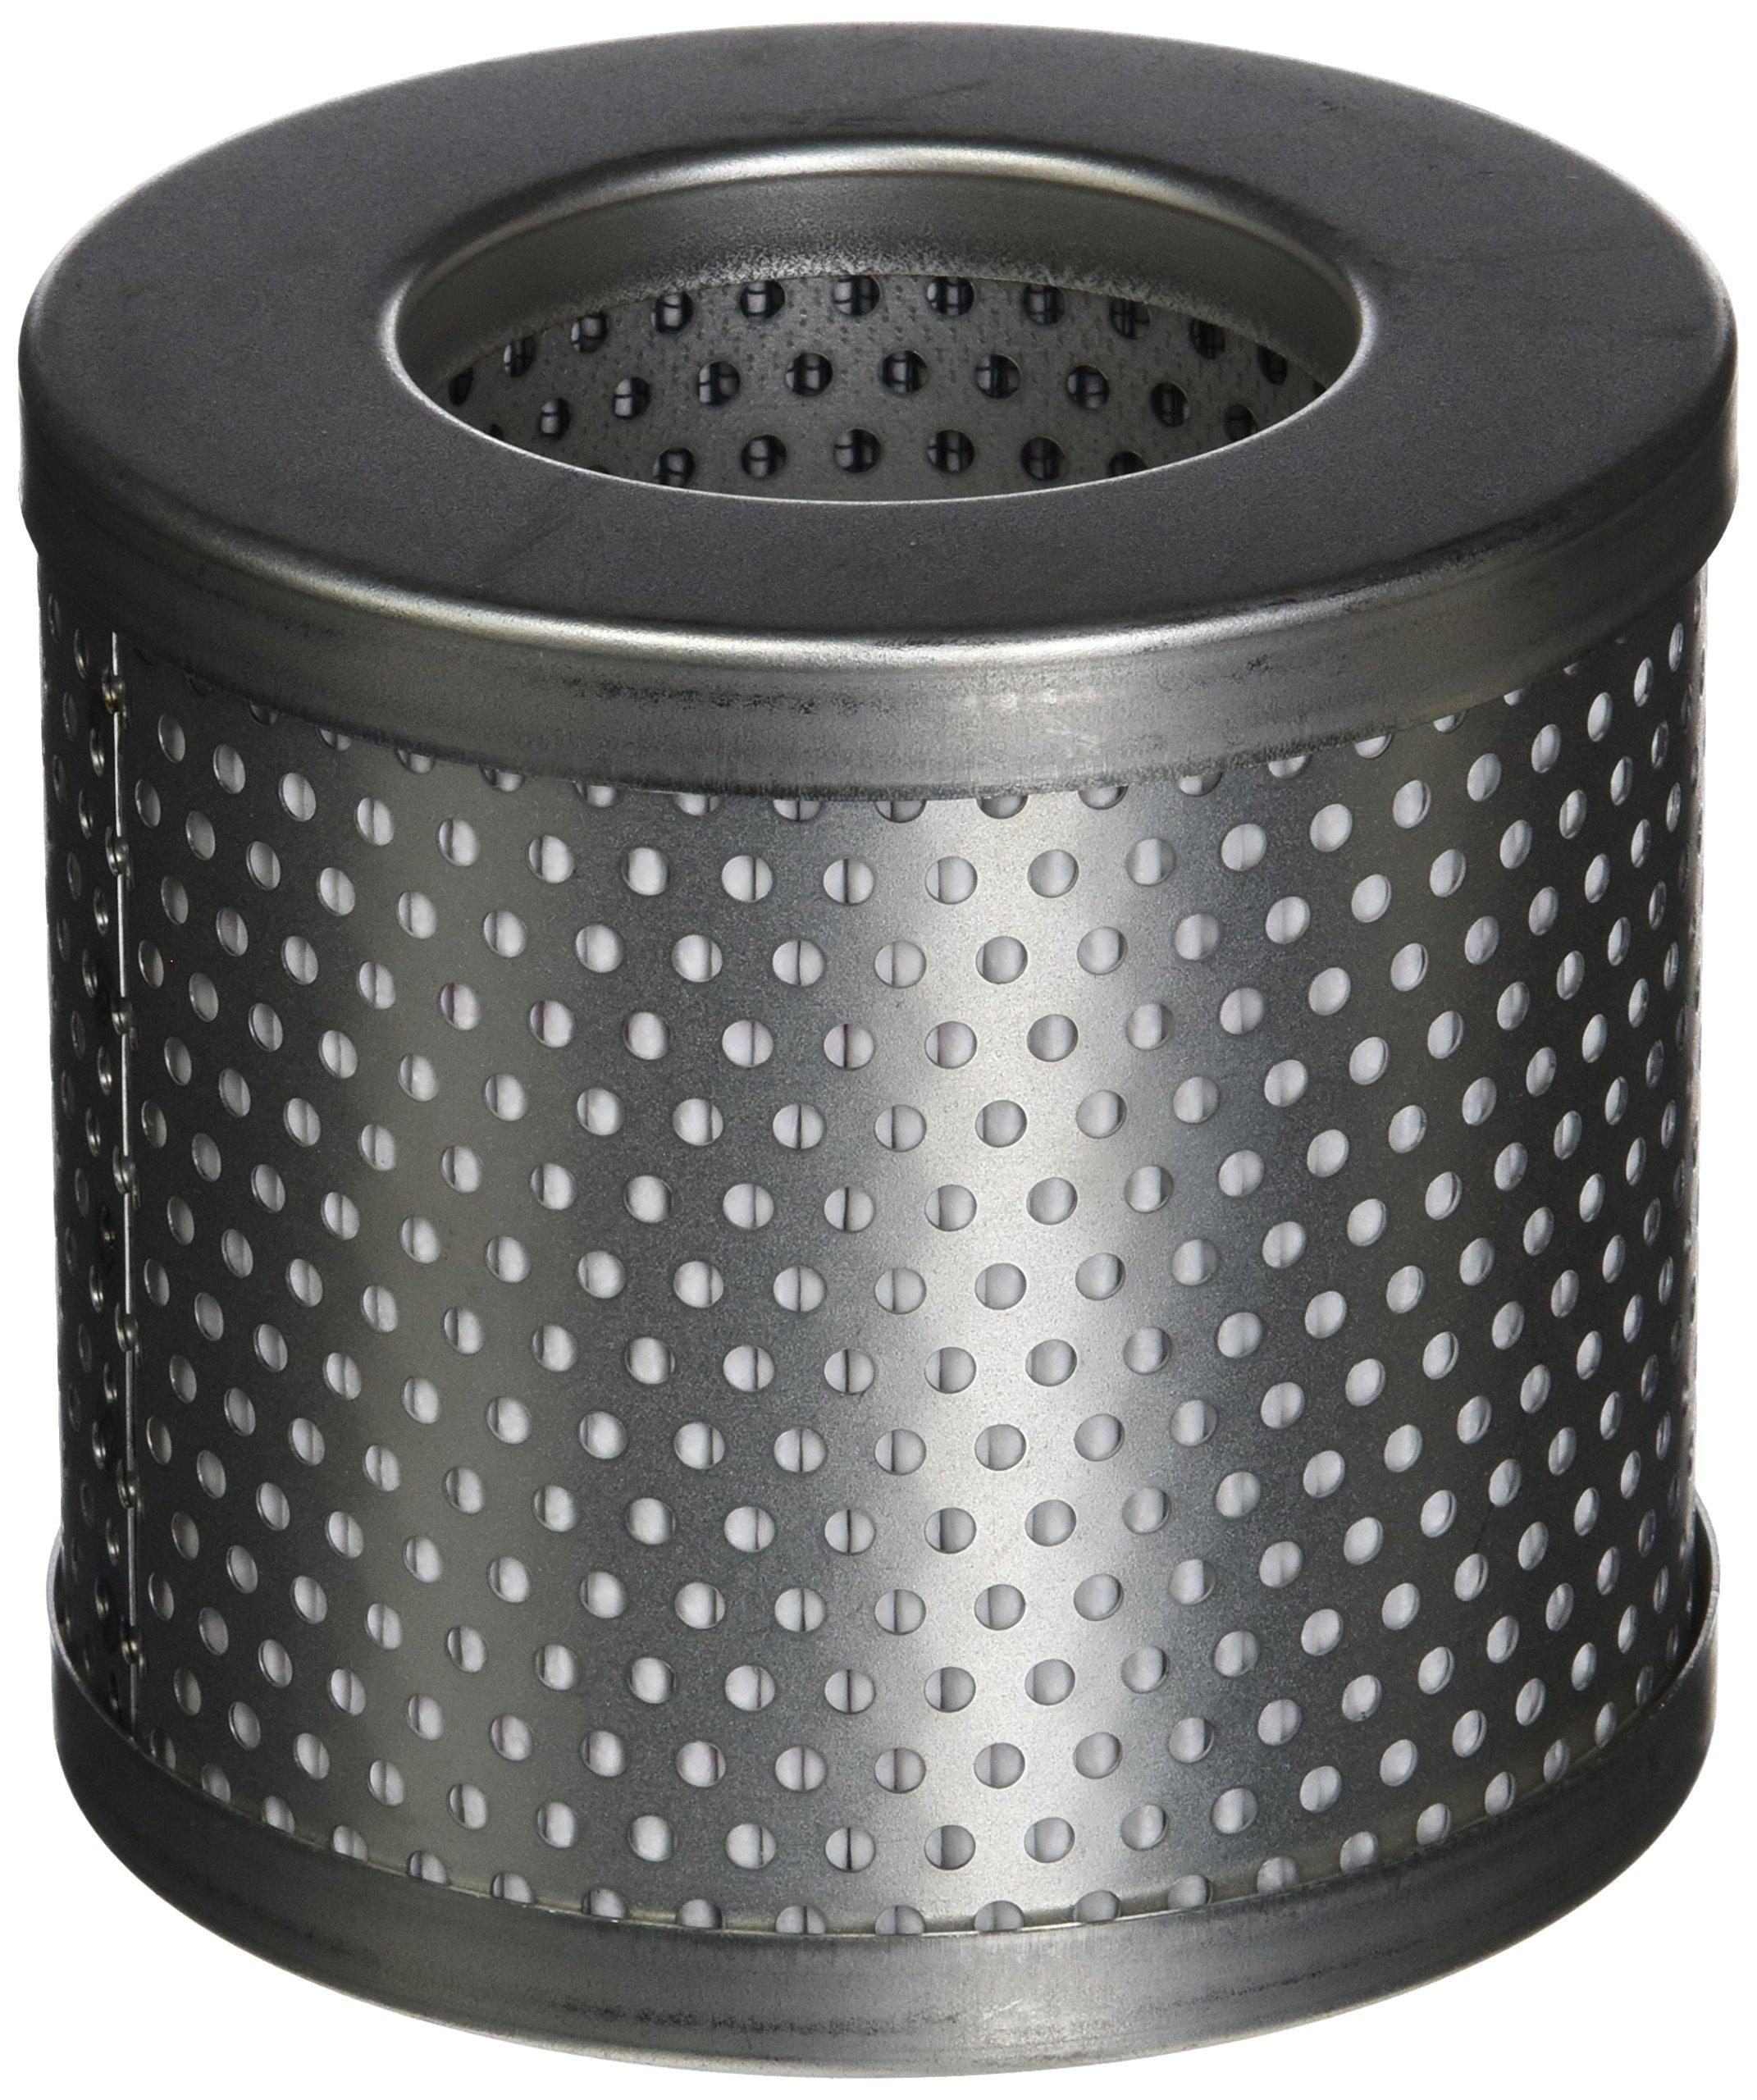 WIX Filters - 57001 Heavy Duty Cartridge Hydraulic Metal, Pack of 1